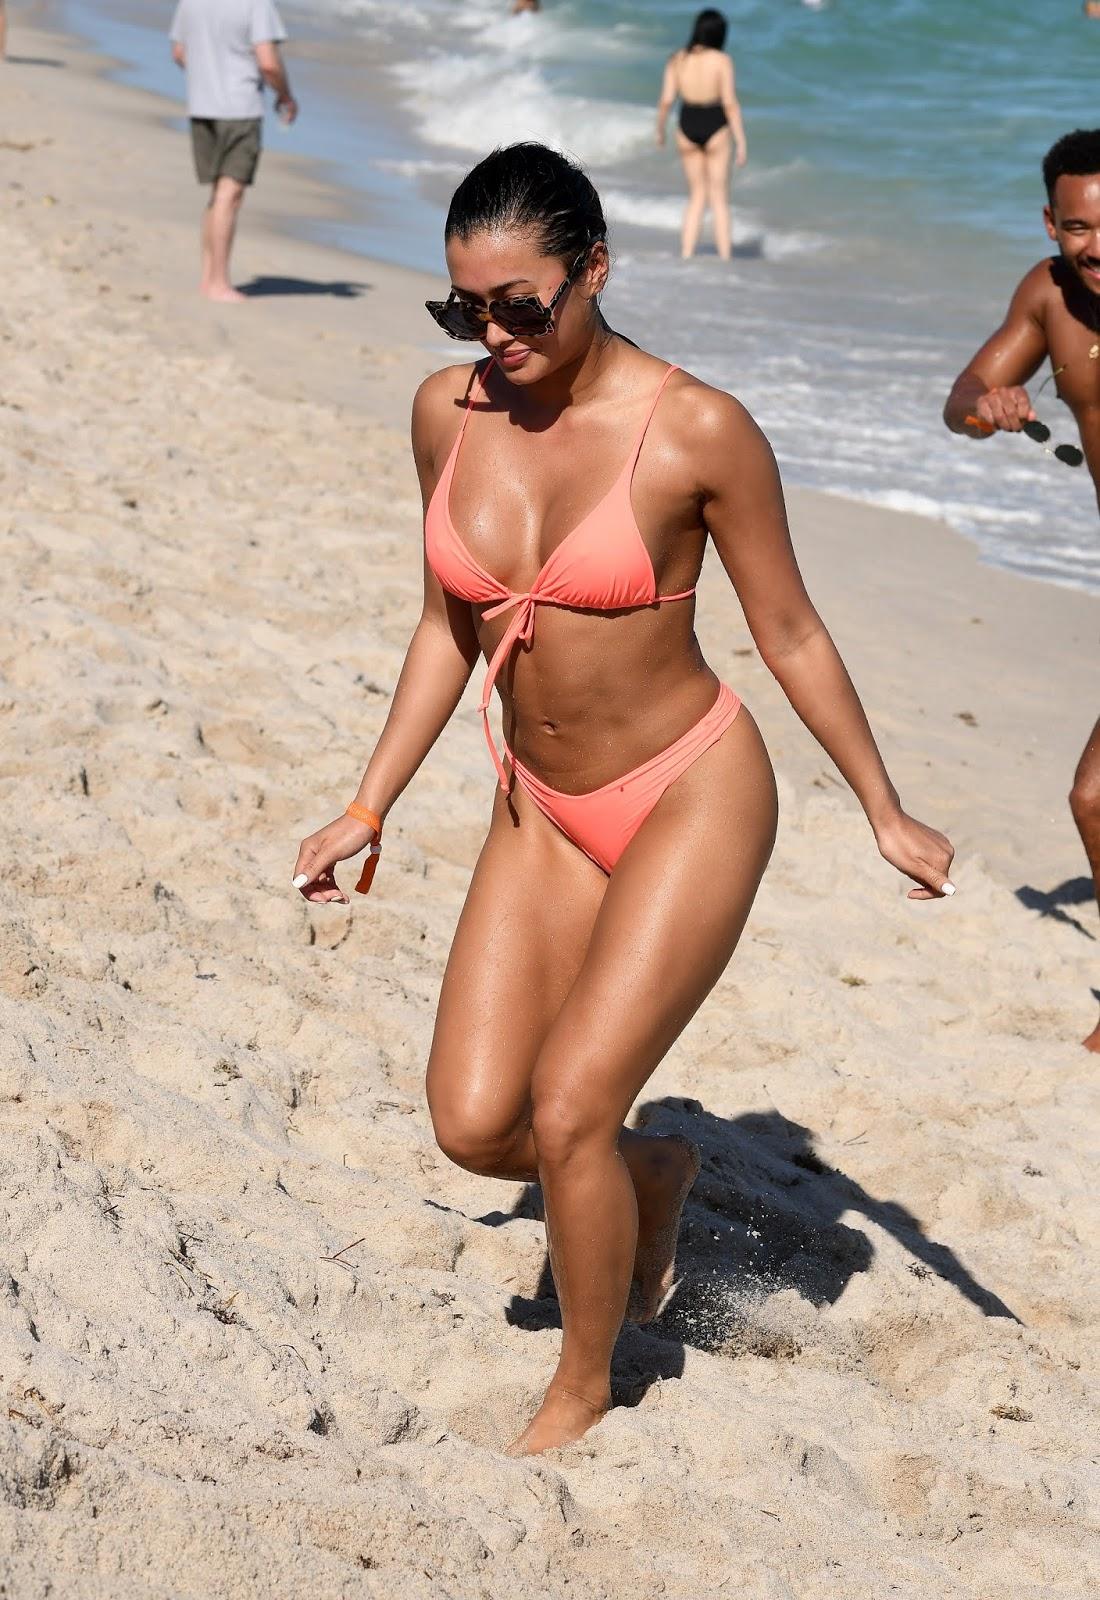 Kazimir 'Kaz' Crossley - Wears a peach bikini as she hits the beach in Miami - 01/02/2019